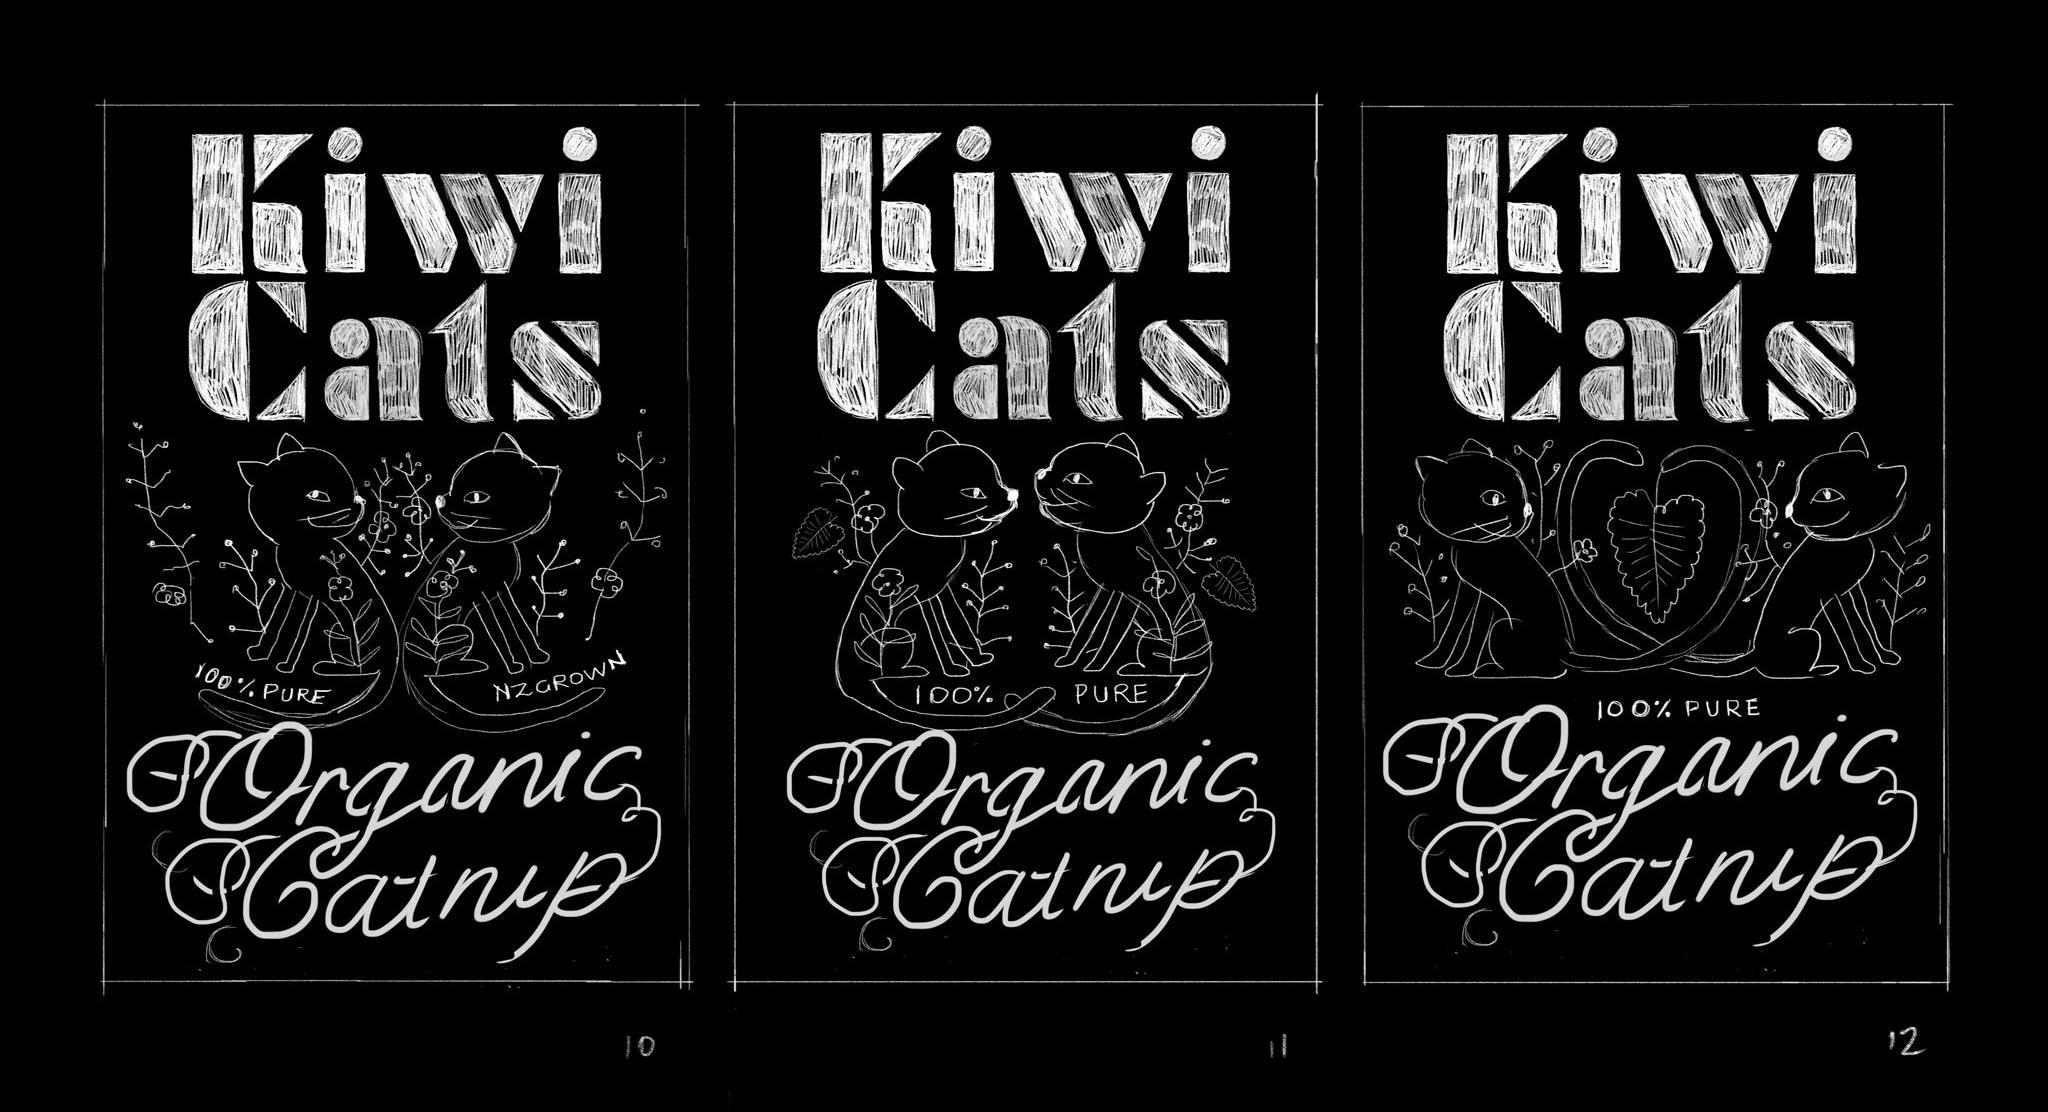 Organic Catnip Label - image 9 - student project